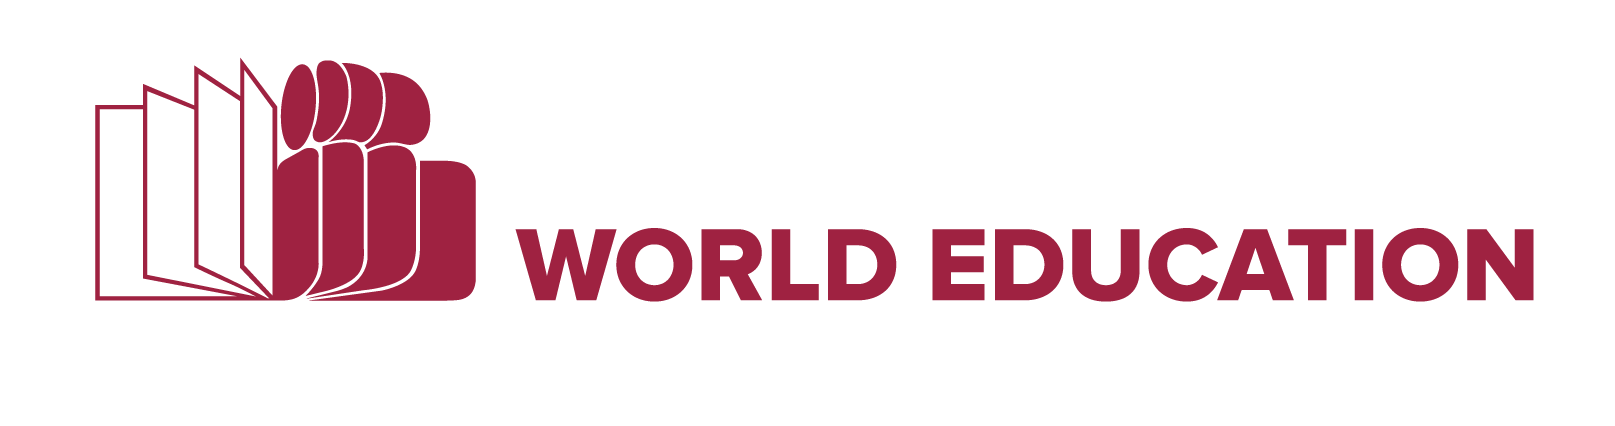 2020 WEI Logo Horizontal Silja Kallenbach